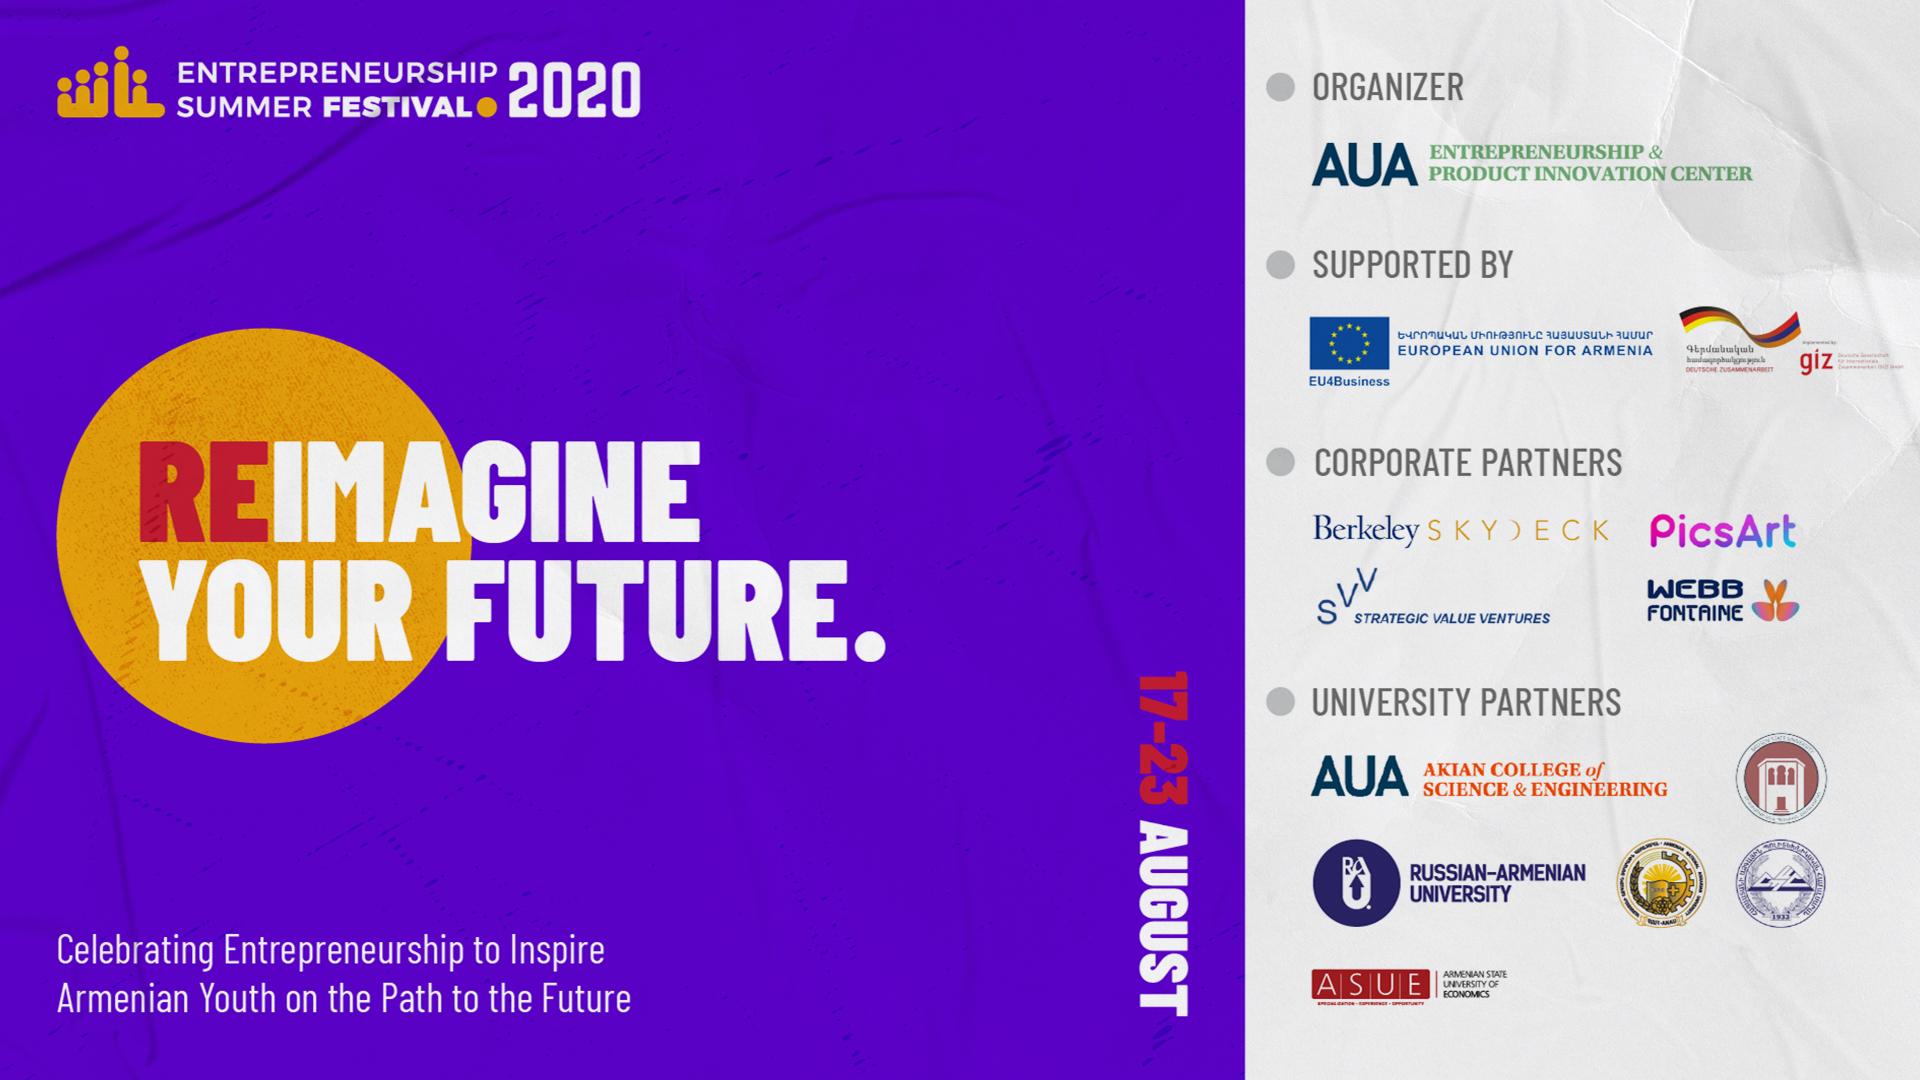 Entrepreneurship Summer Festival 2020: Reimagine Your Future